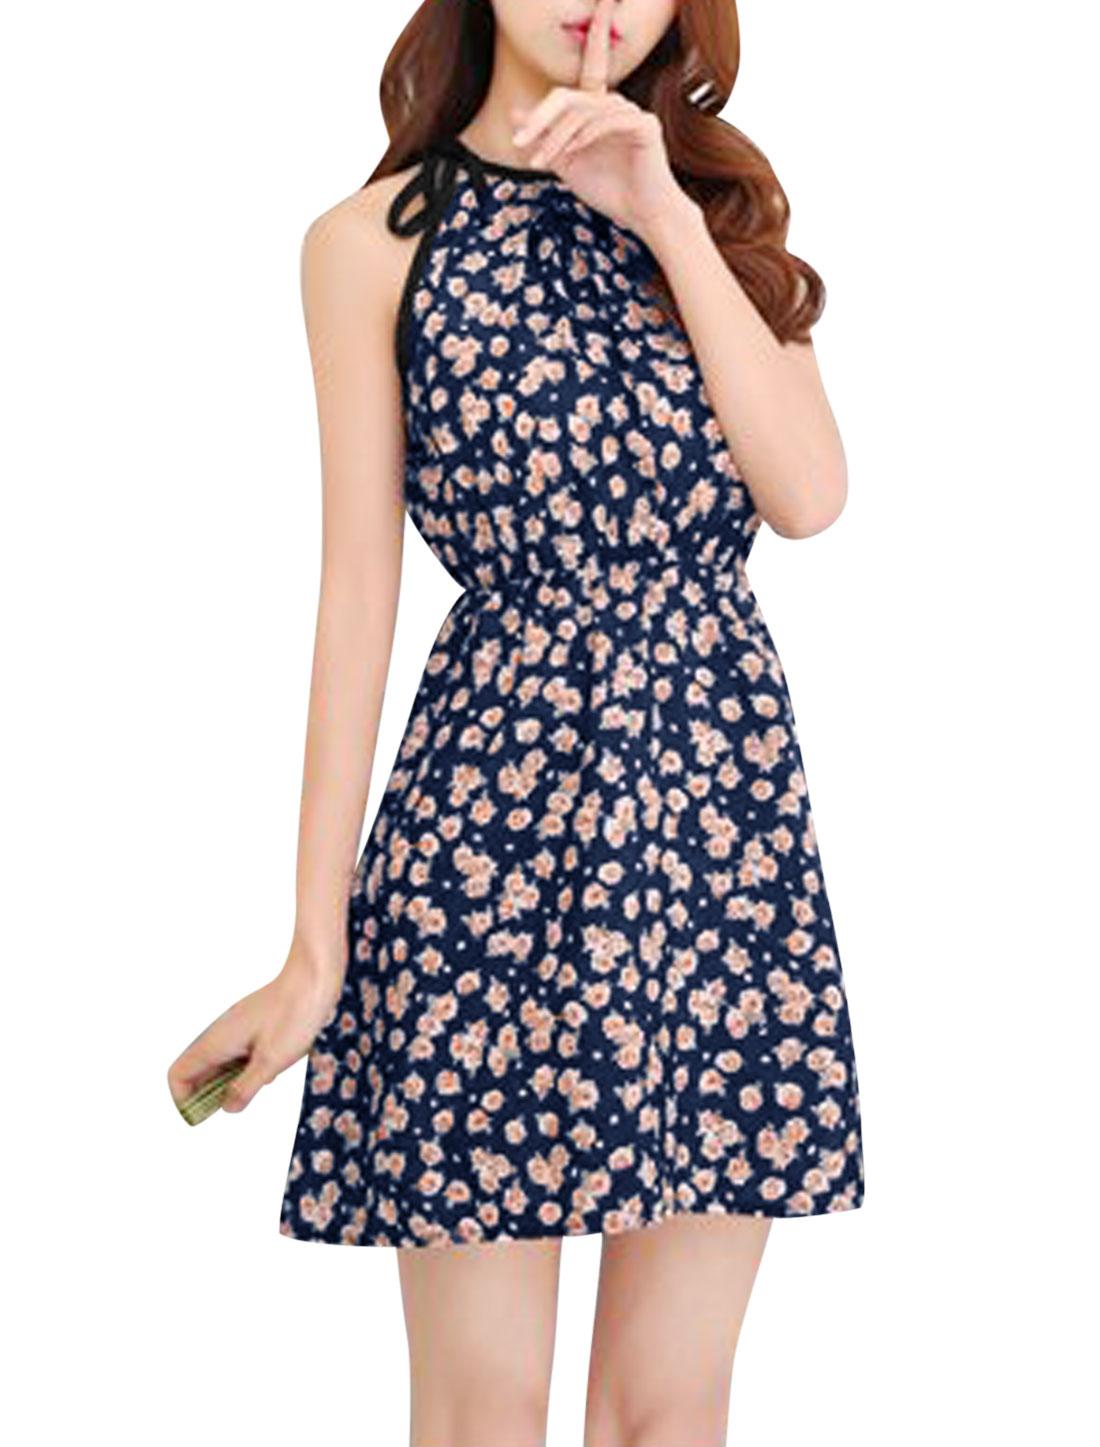 Woman Flower Prints Halter Neck Selt Tie Detail Slipover A Line Sundress Navy Blue XS